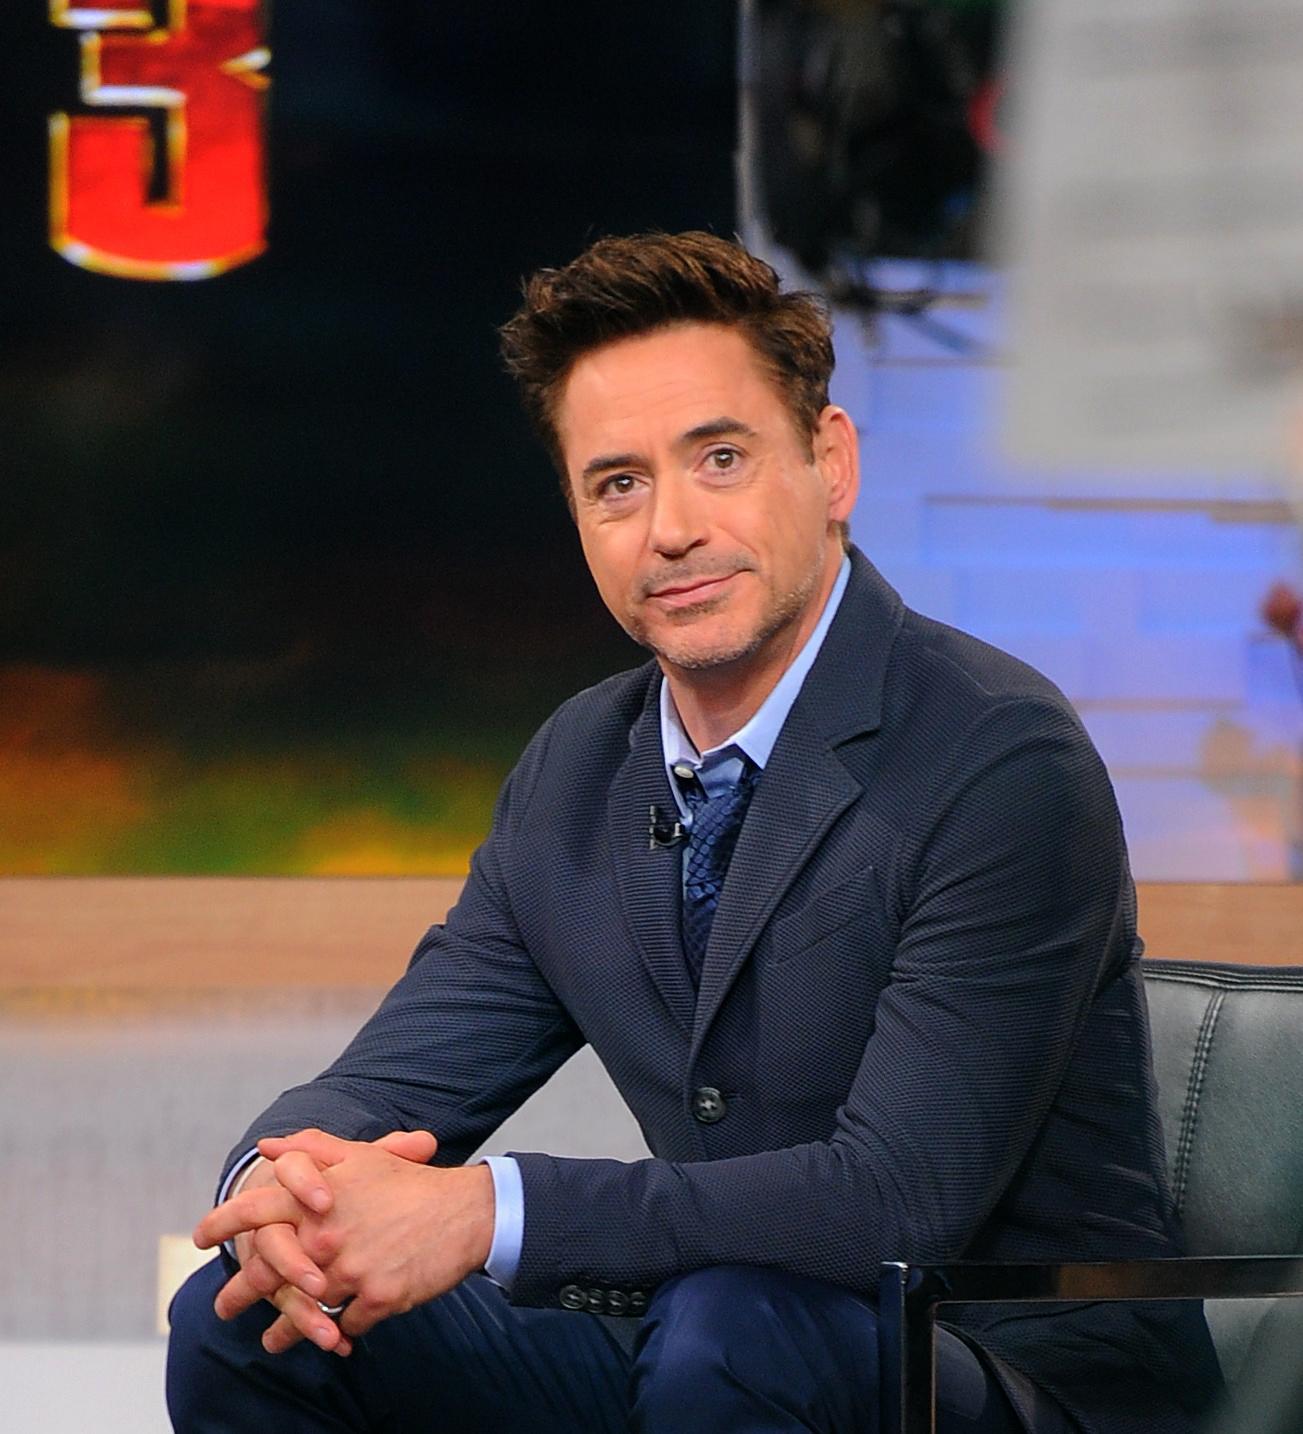 Robert Downey Jr. Is Producing an '80s Rehab Drama - Cinema, Theater ... Robert Downey